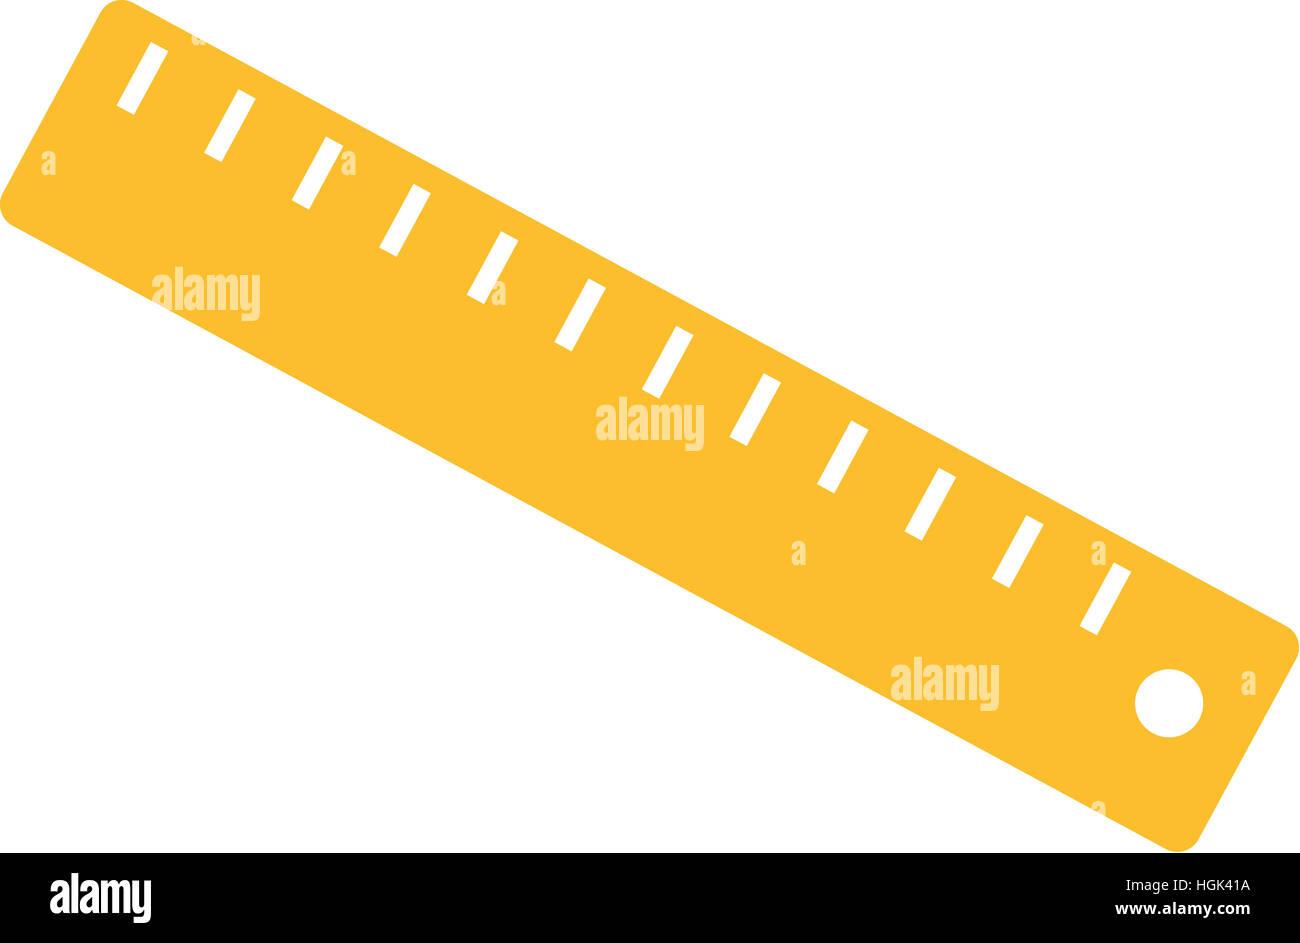 Yellow Ruler - Stock Image